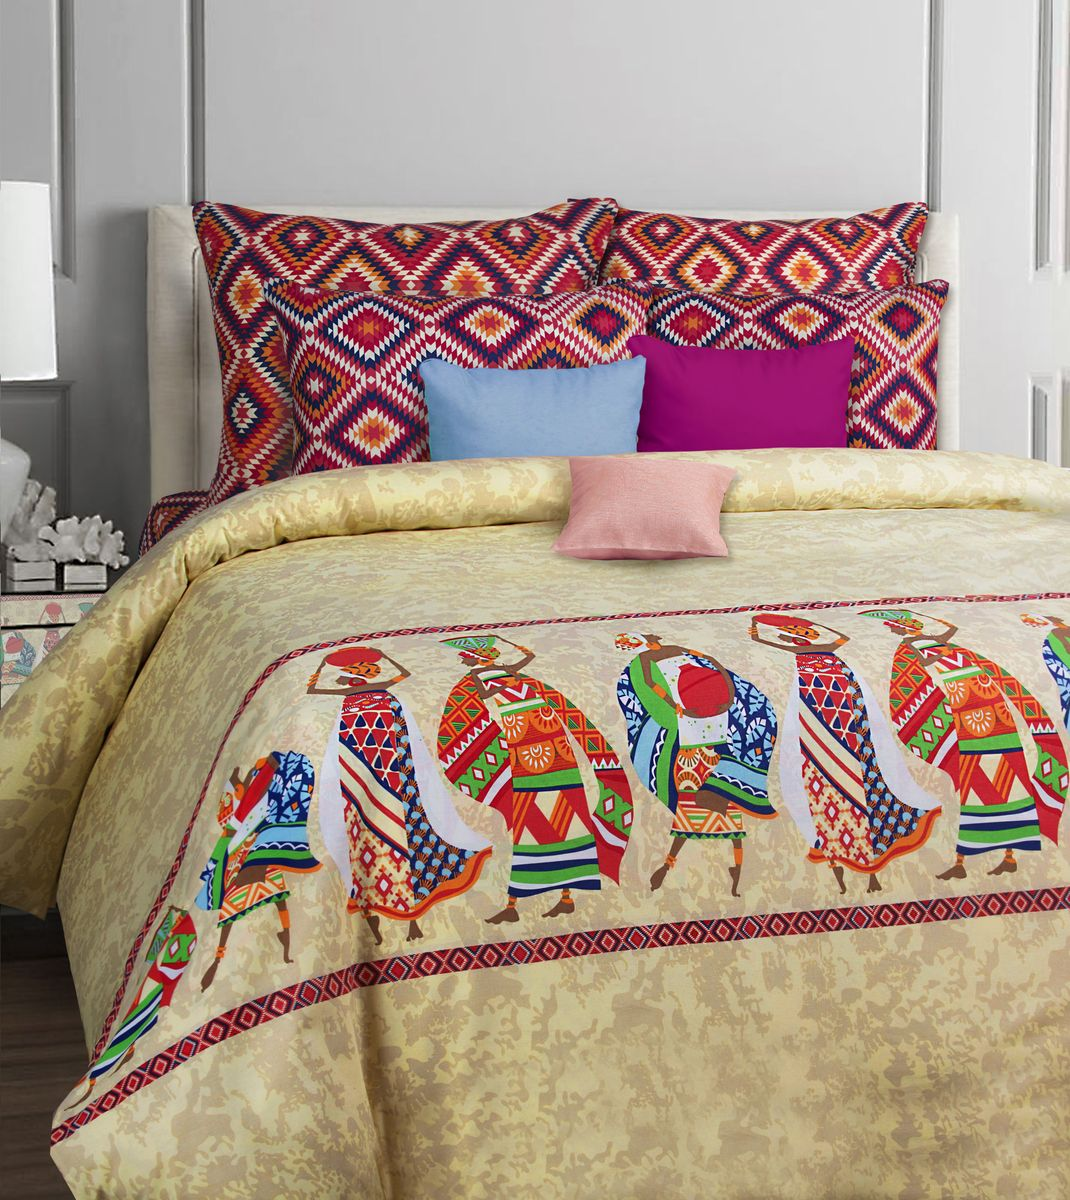 Комплект белья Mona Liza Classik. Afrika, 1,5-спальный, наволочки 50х70 комплект белья mona liza classik malta евро кпб бязь наволочки 50х70